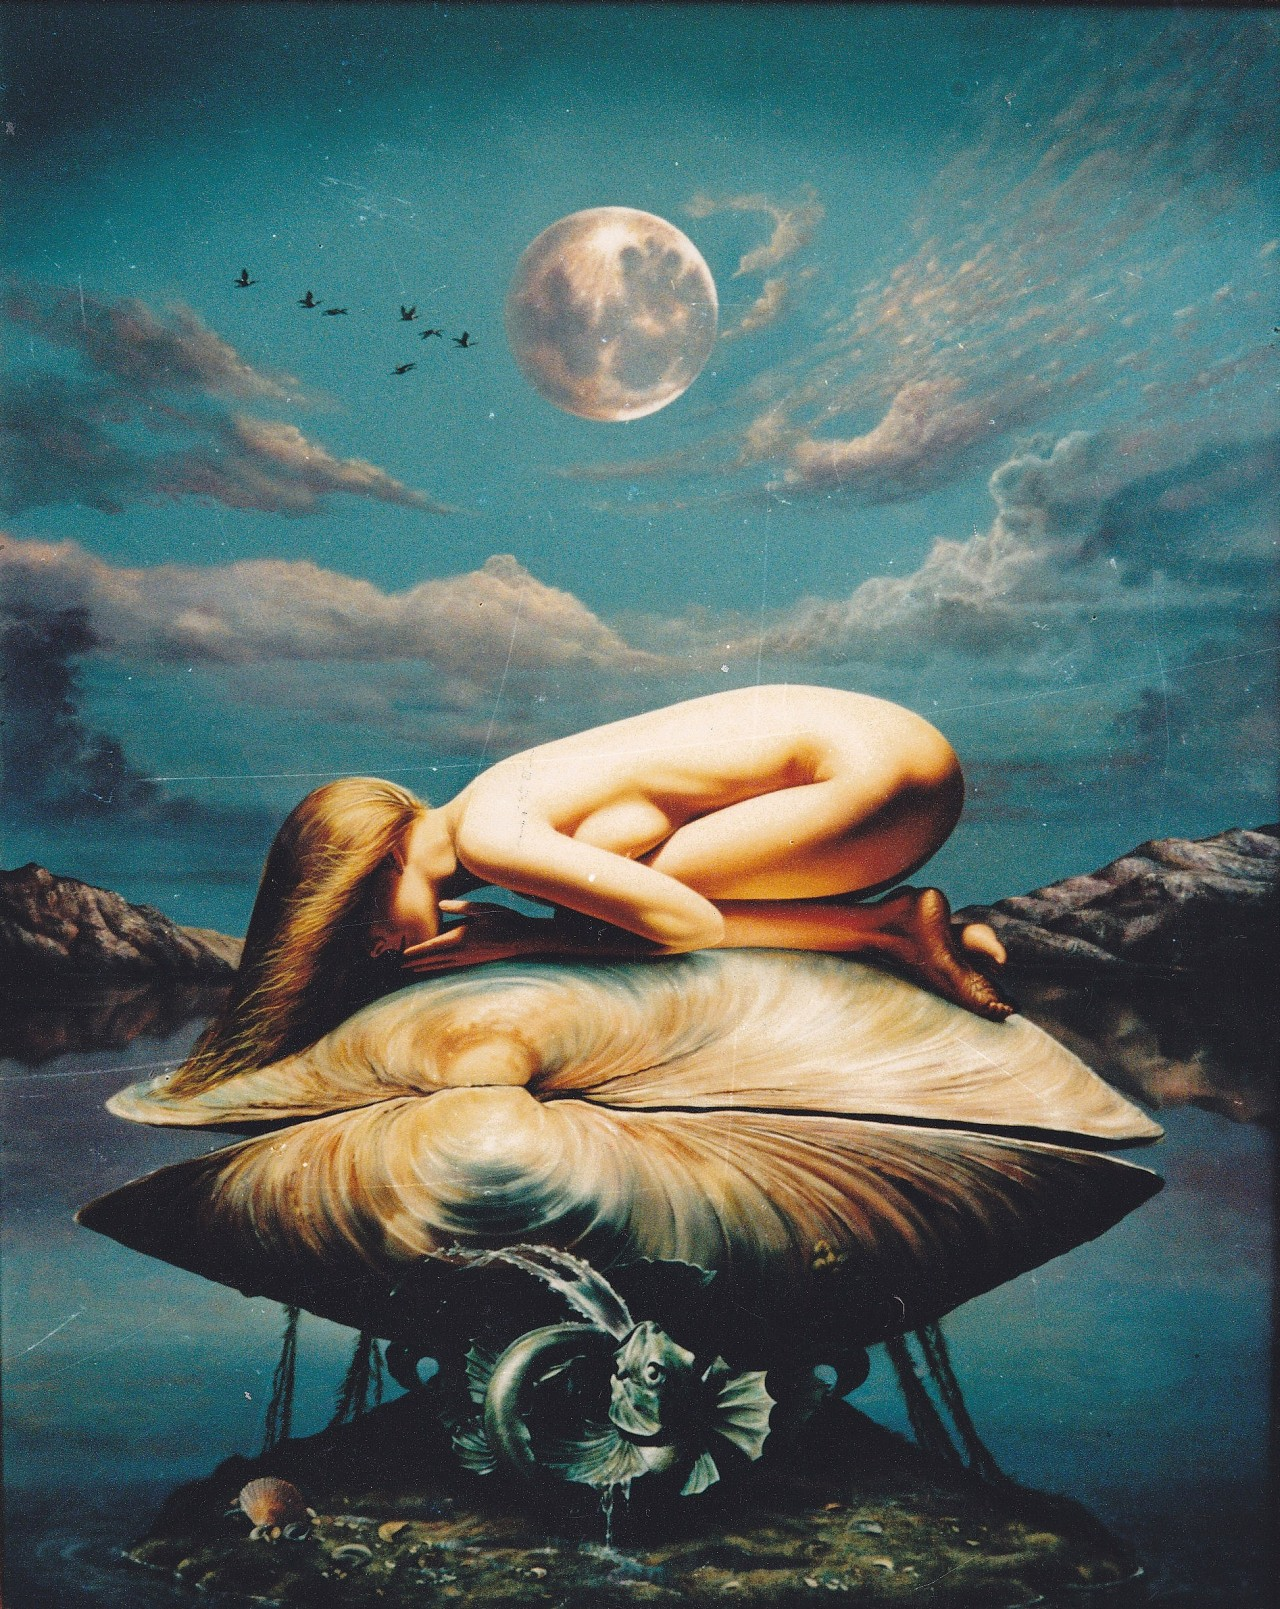 Venus by Christiane Vleugels